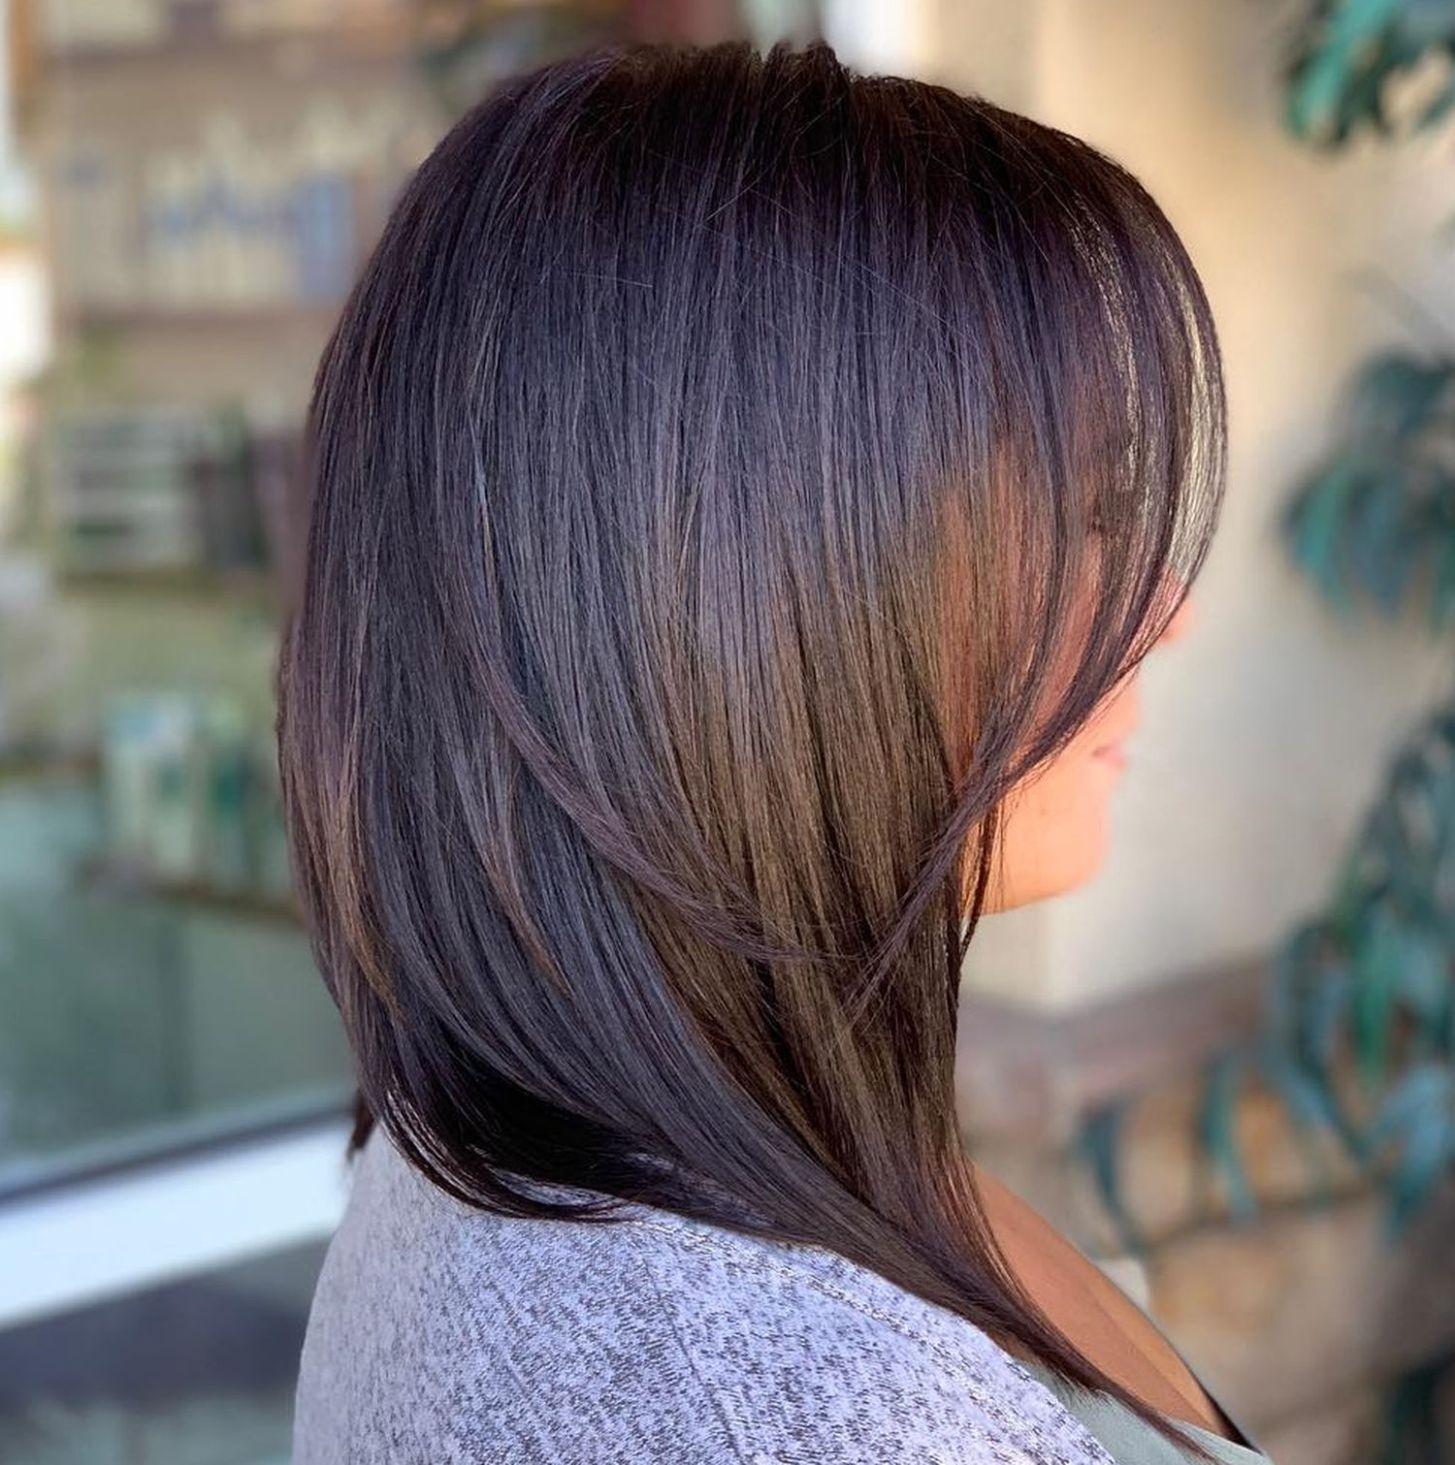 Smooth A-Line Bob in 2020 | Straight hairstyles, Medium length hair styles, Choppy bob hairstyles